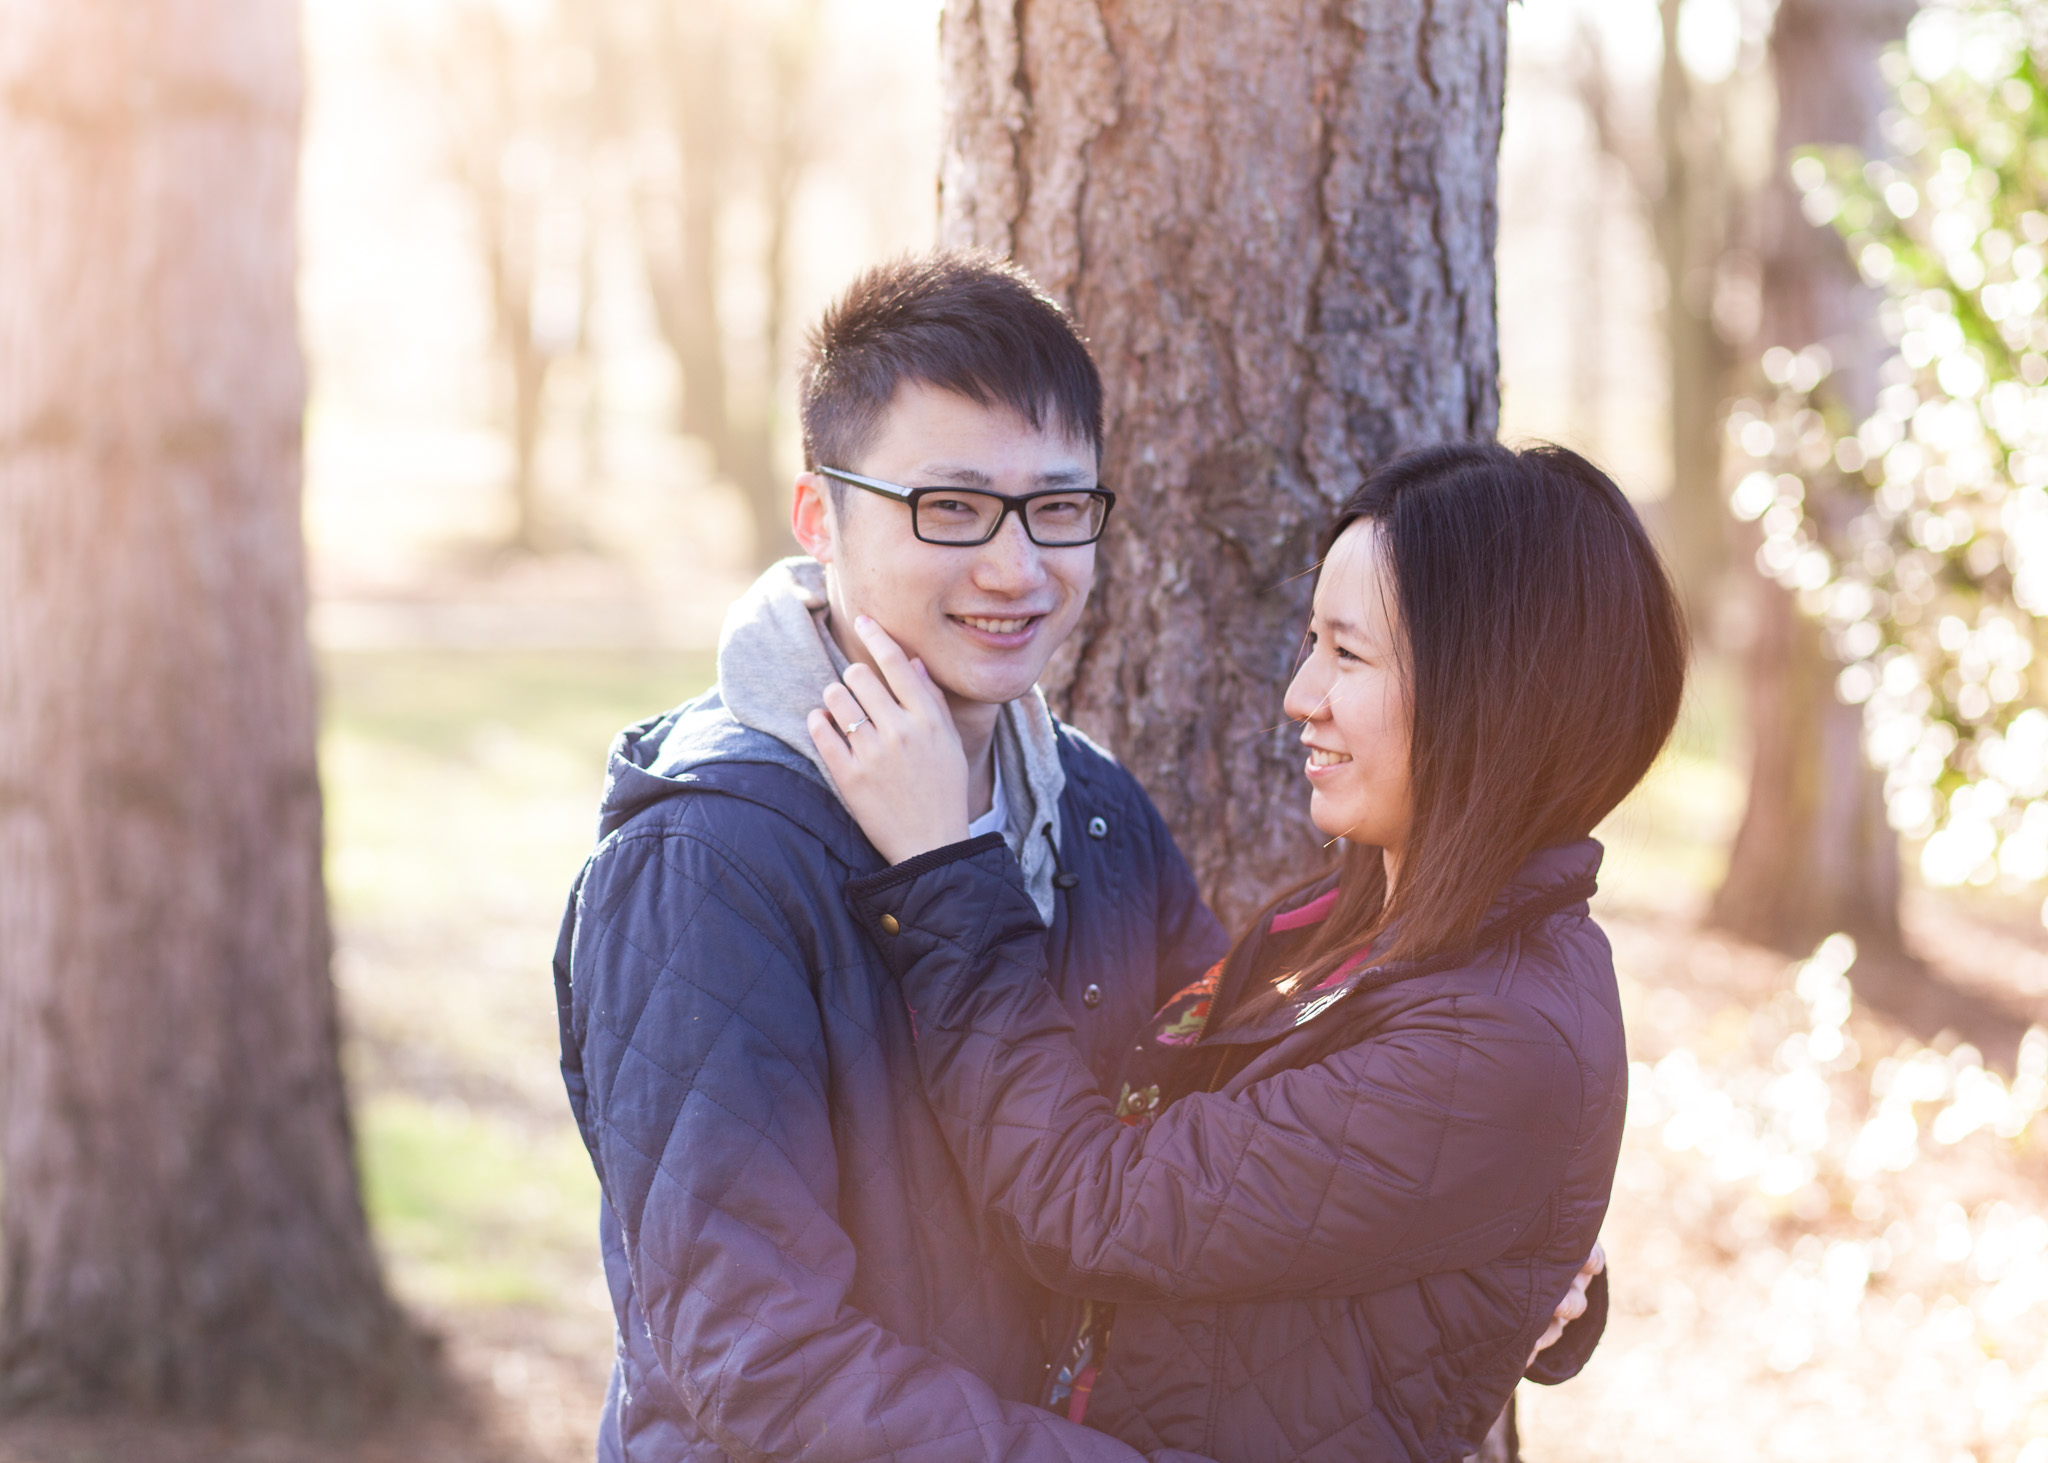 20140813-01-Dave & Tammy Engagement Shoot-3.jpg